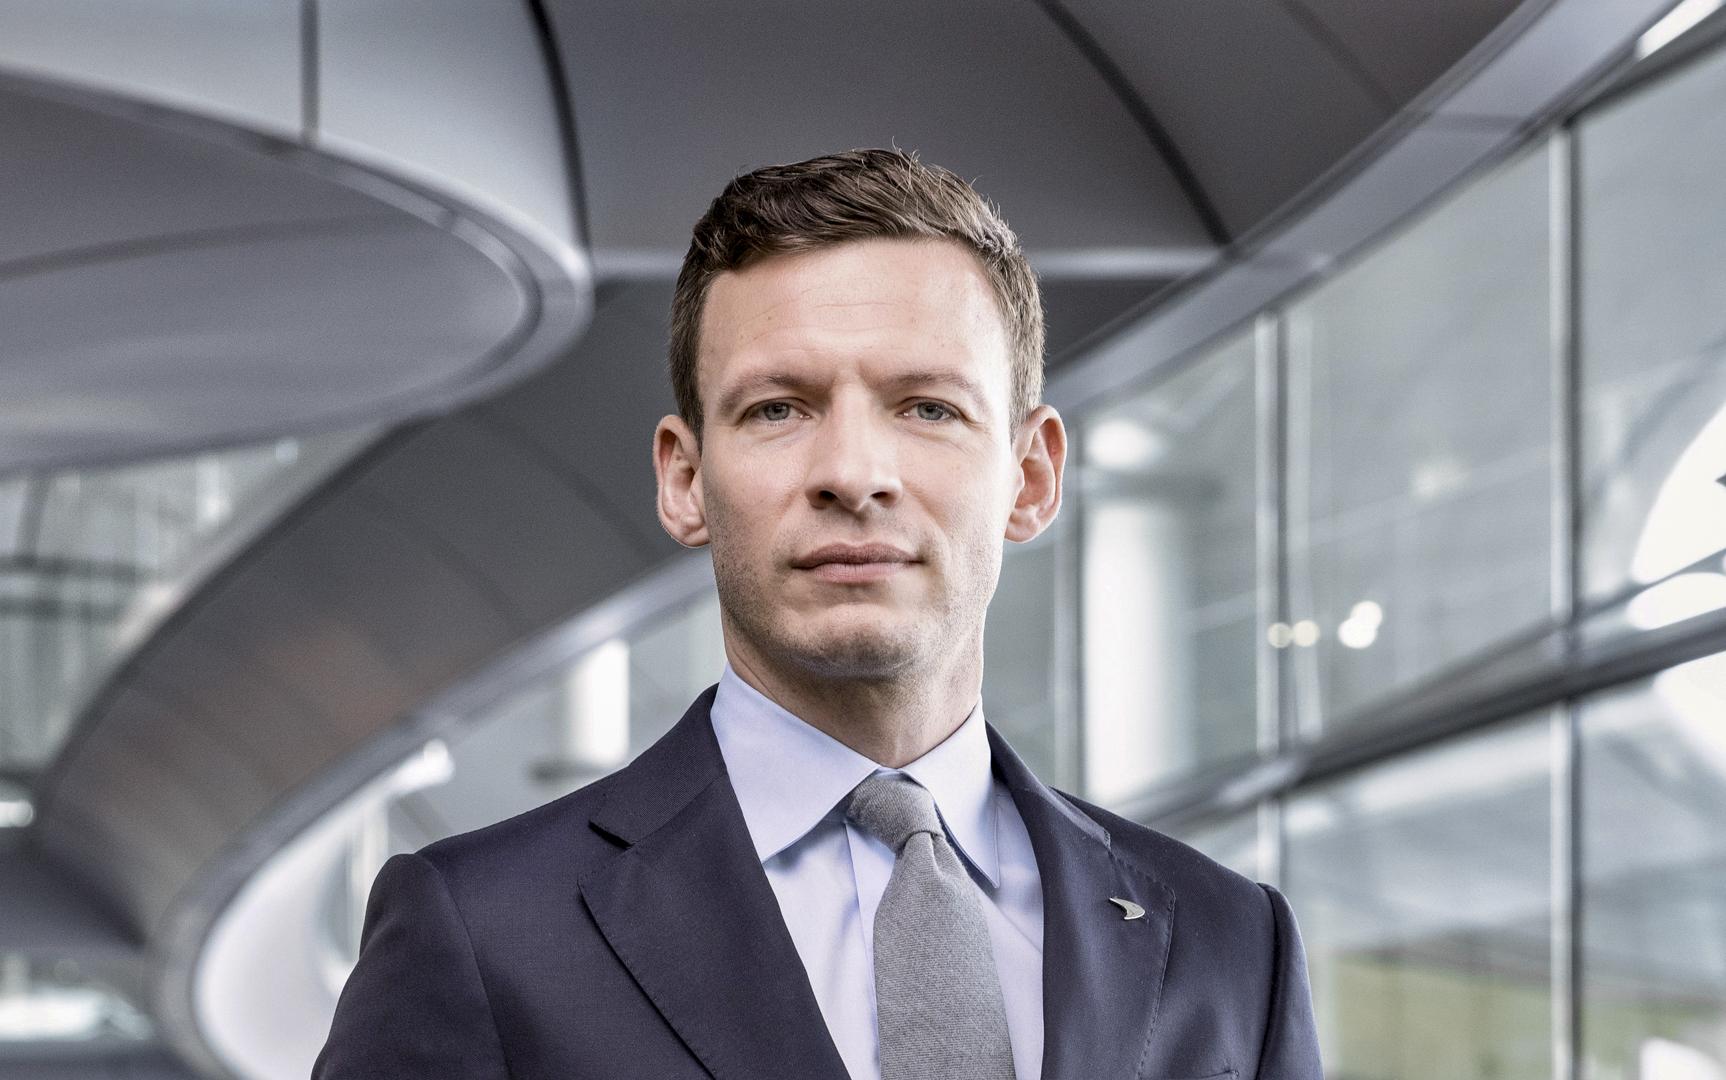 McLaren Automotive appoints George Biggs as Commercial Executive Director